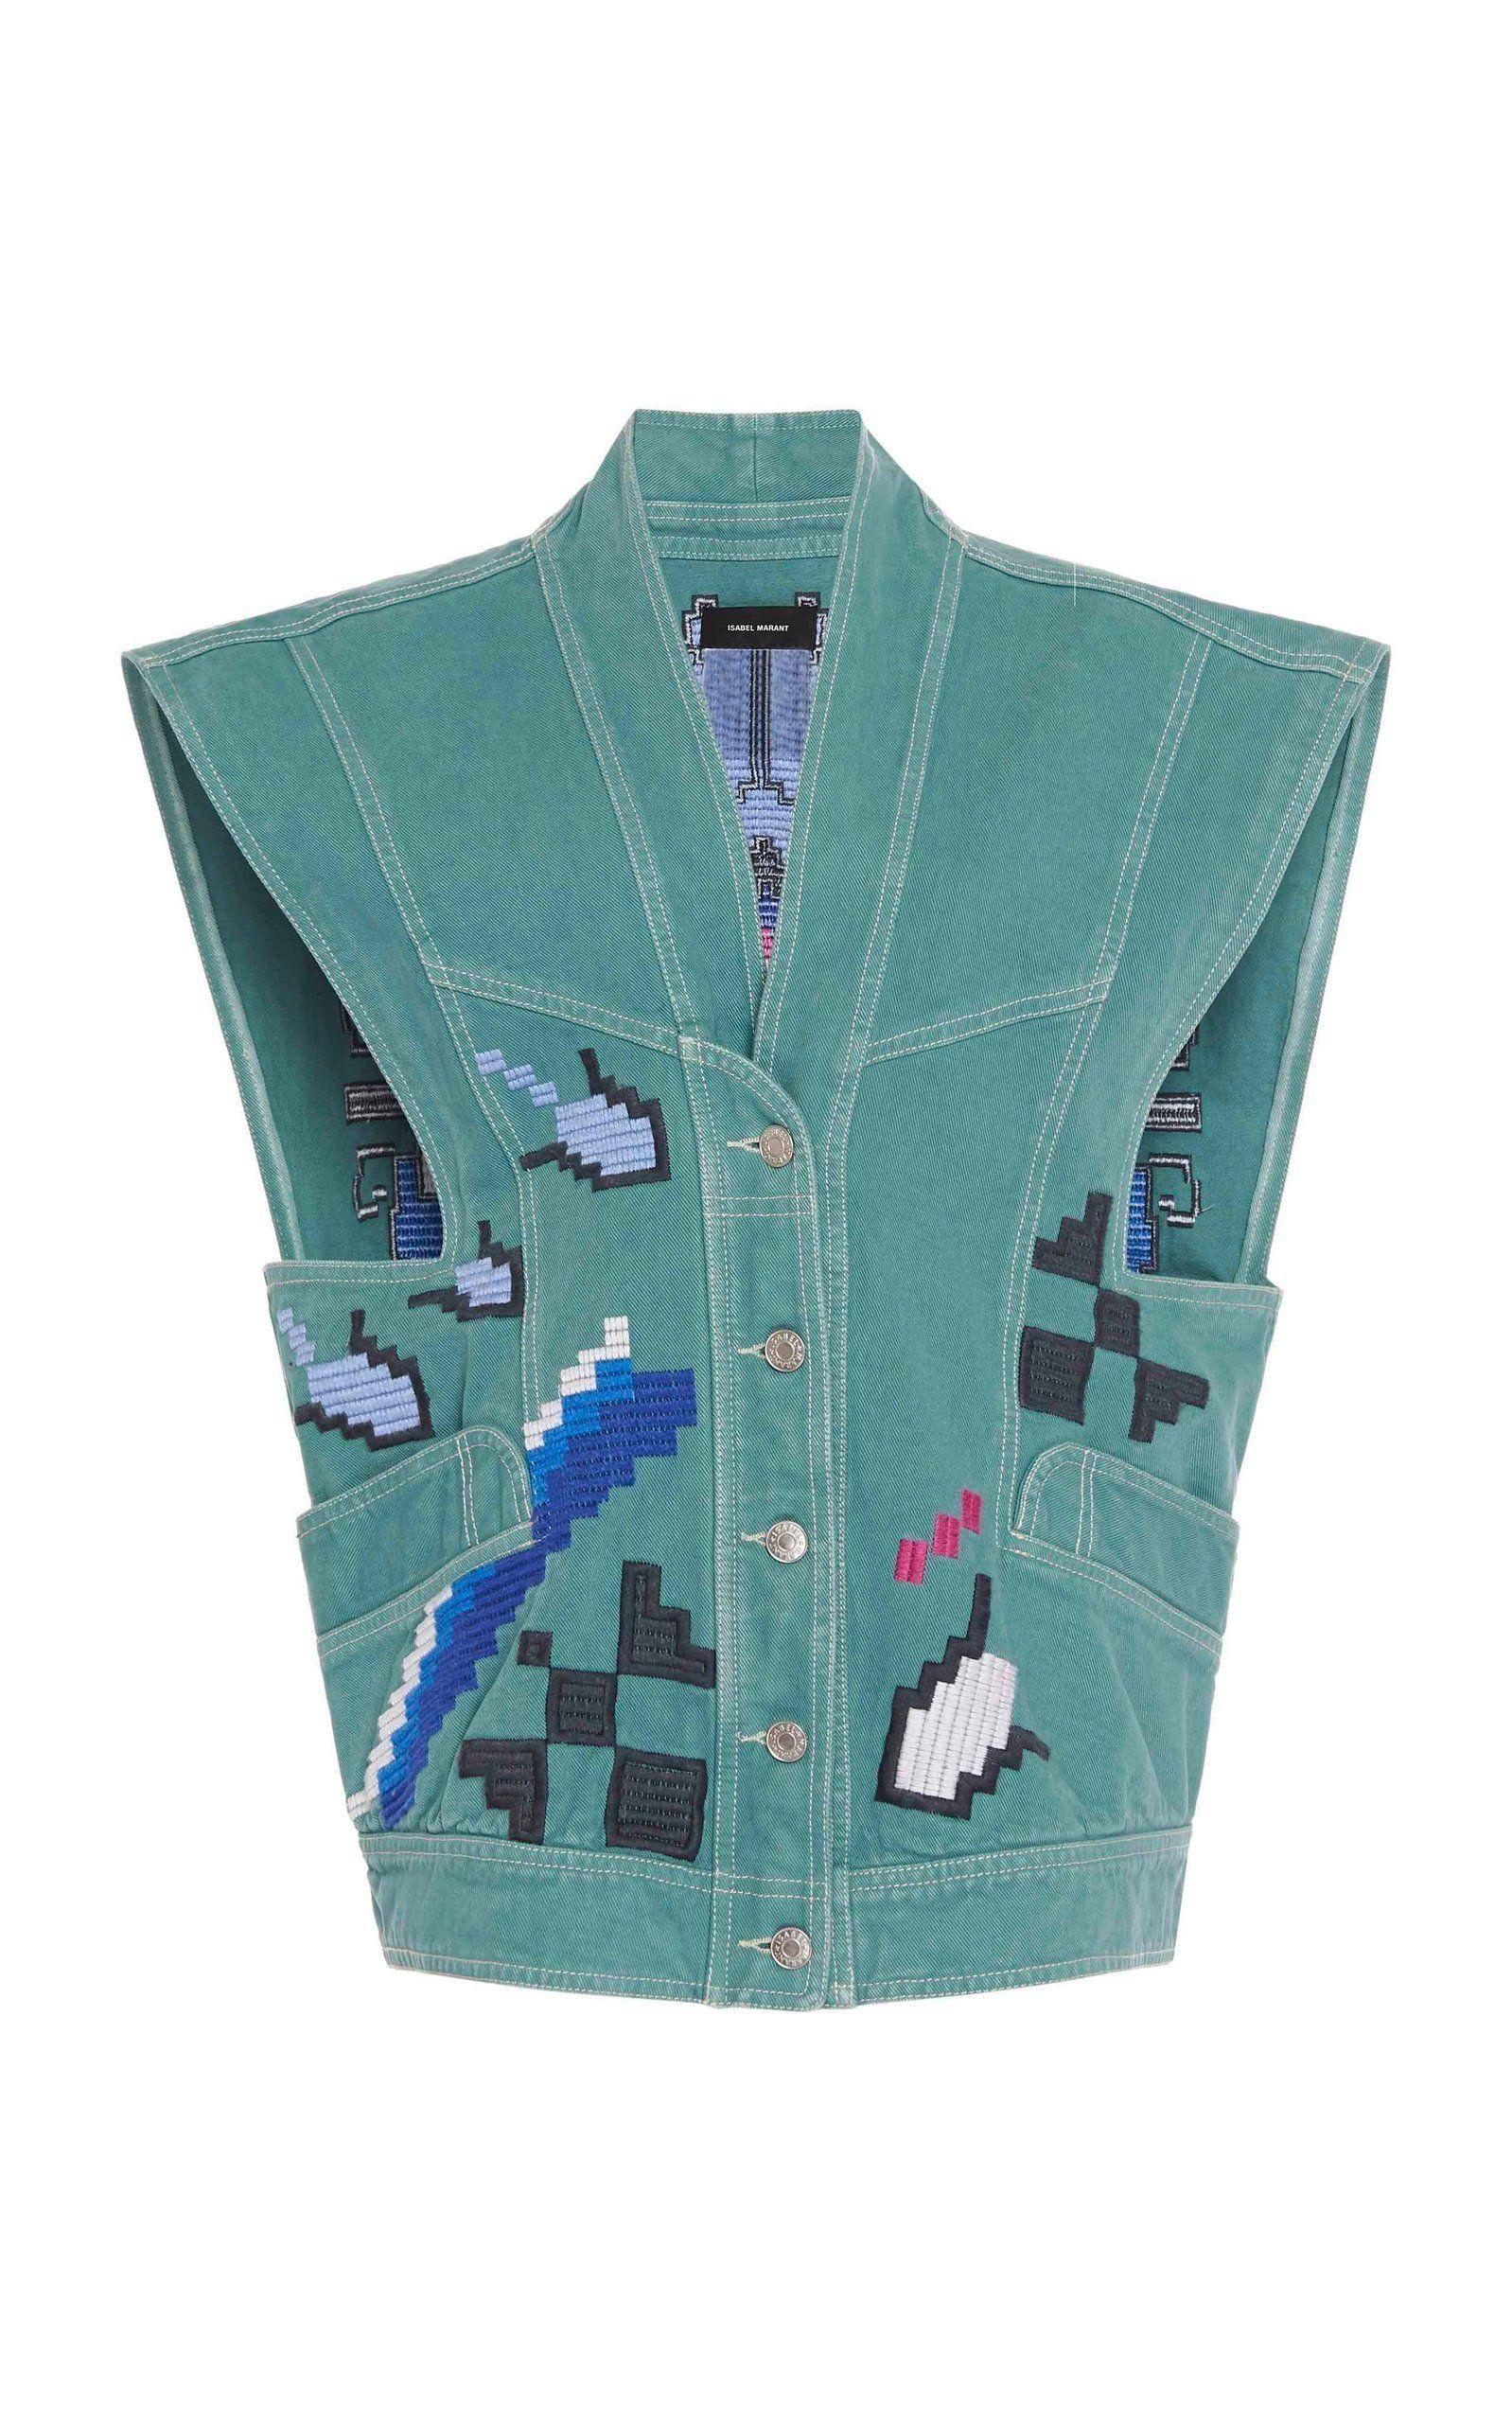 Vobaga womens Blue Striped Denim Distresses Style Front Flap Pocket Short Overalls